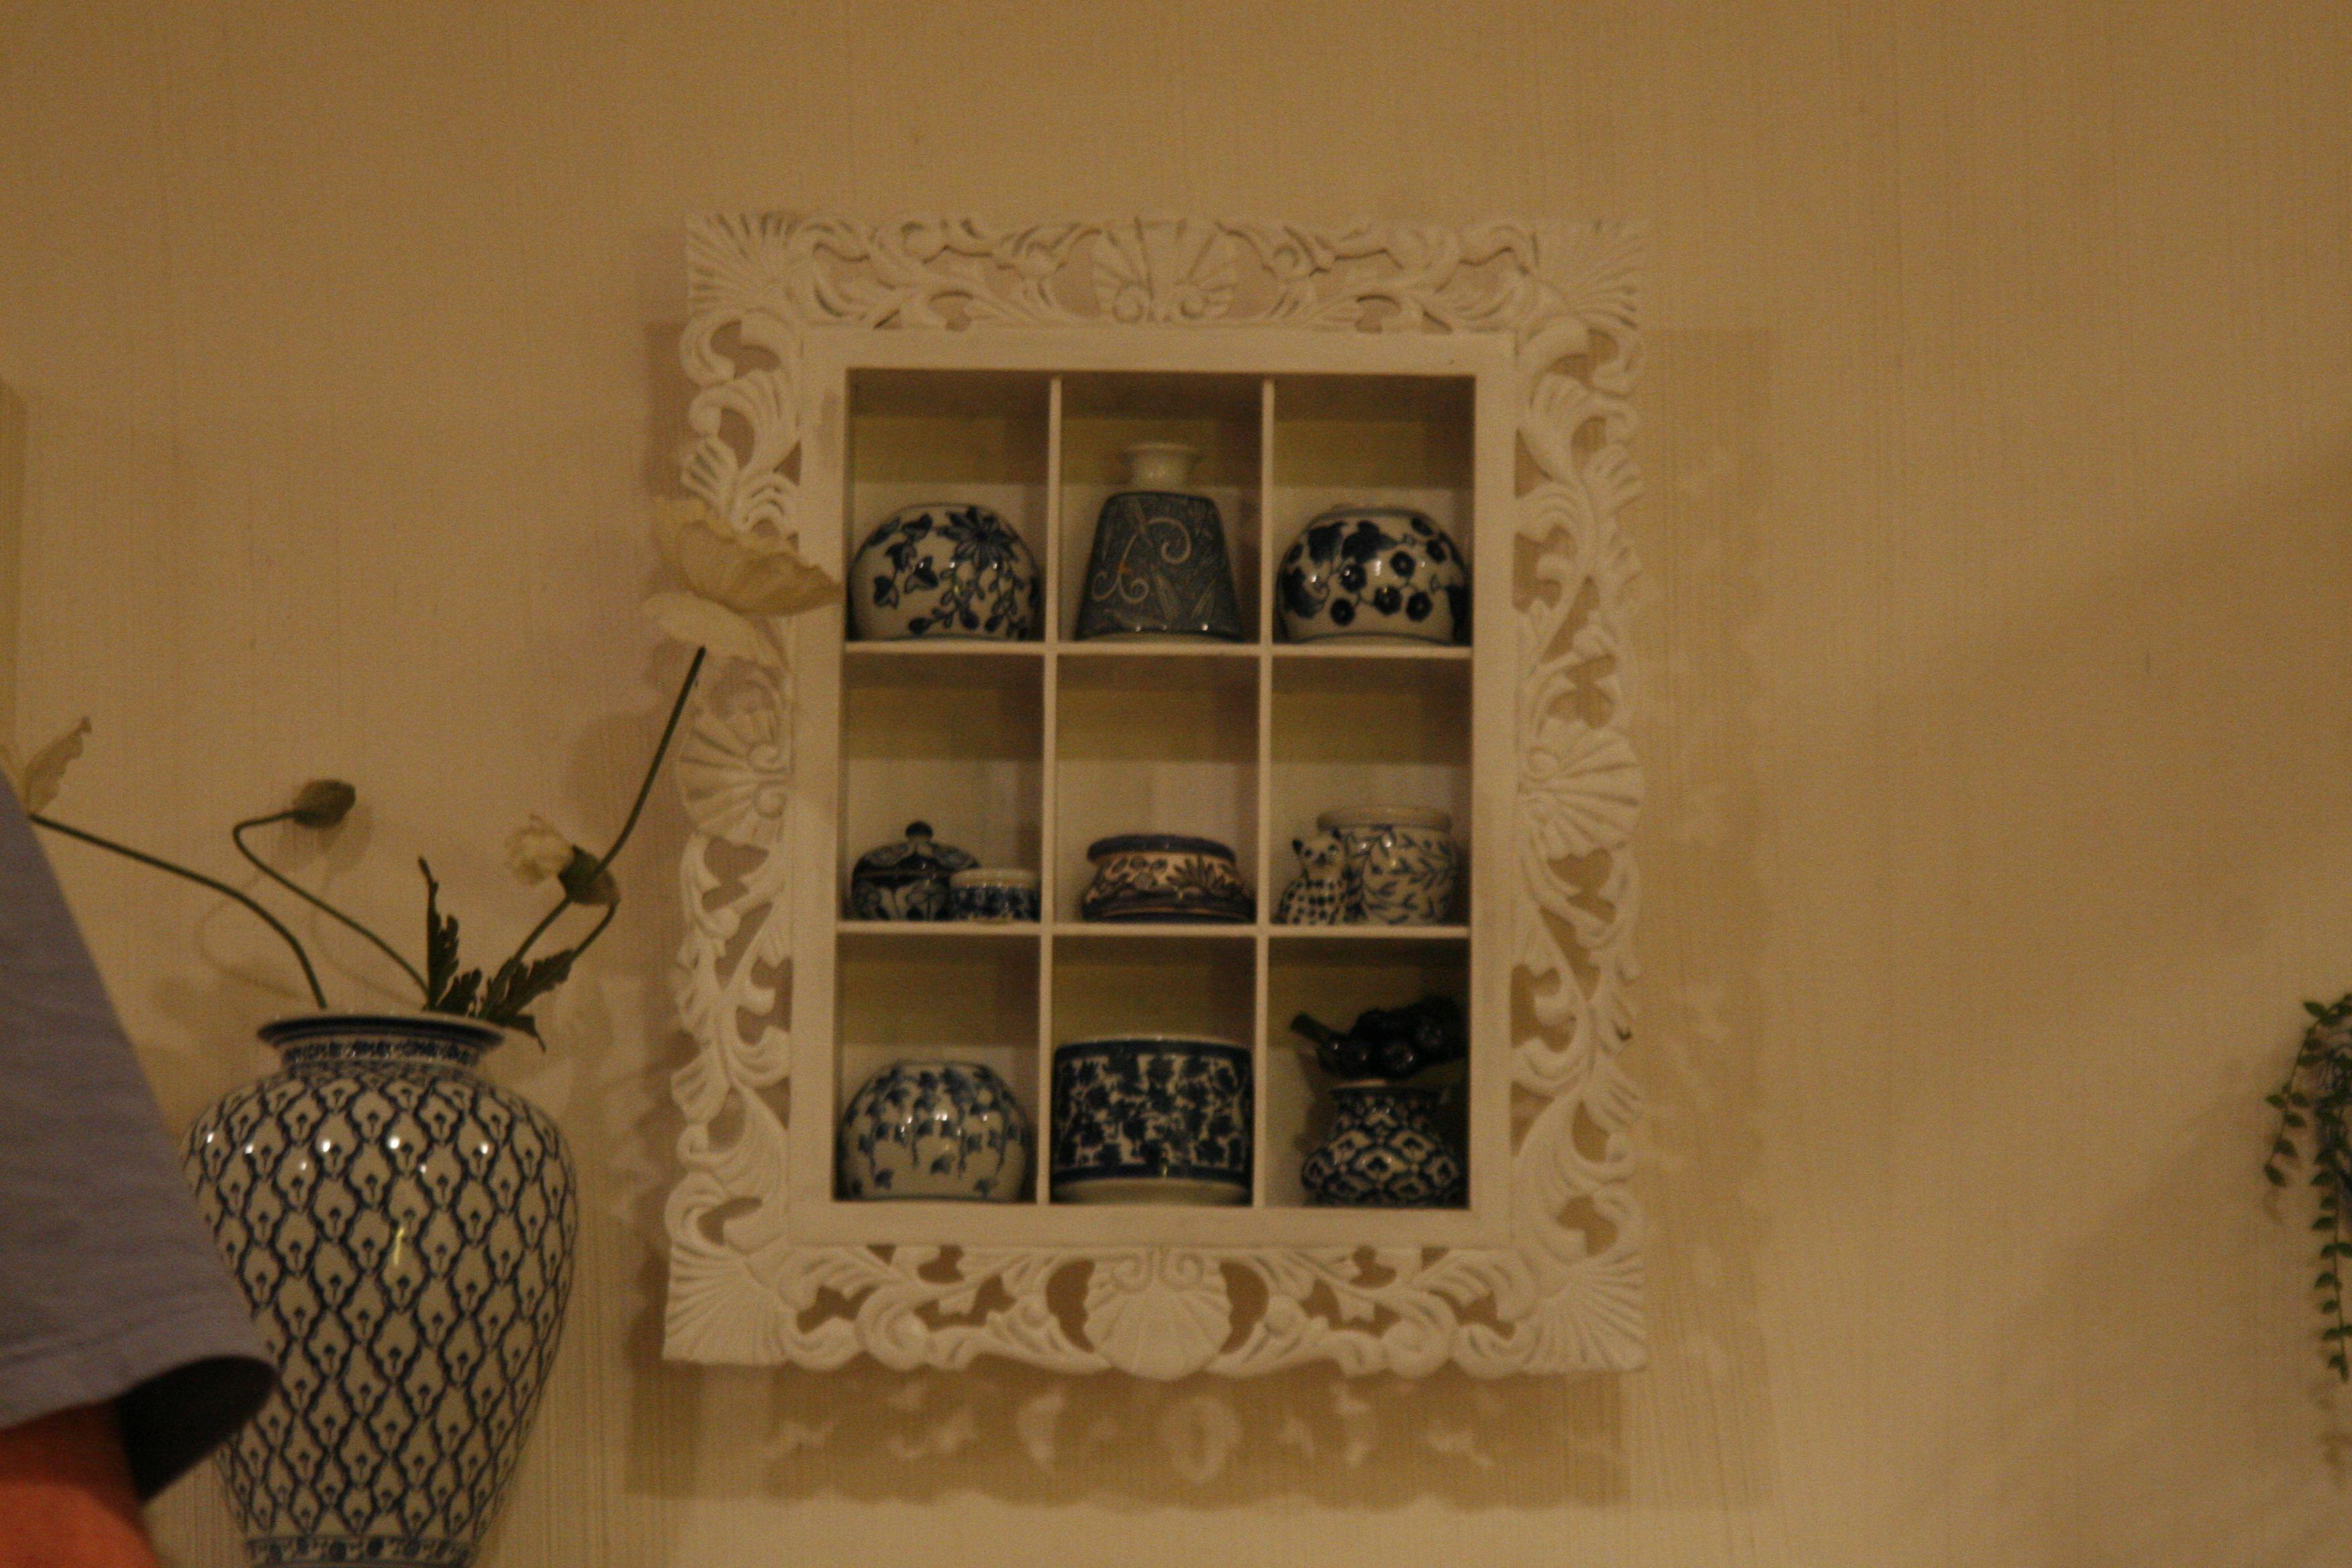 Wall Shelf | HOME DECOR IDEAS | Pinterest on Pinterest Wall Decor  id=52652